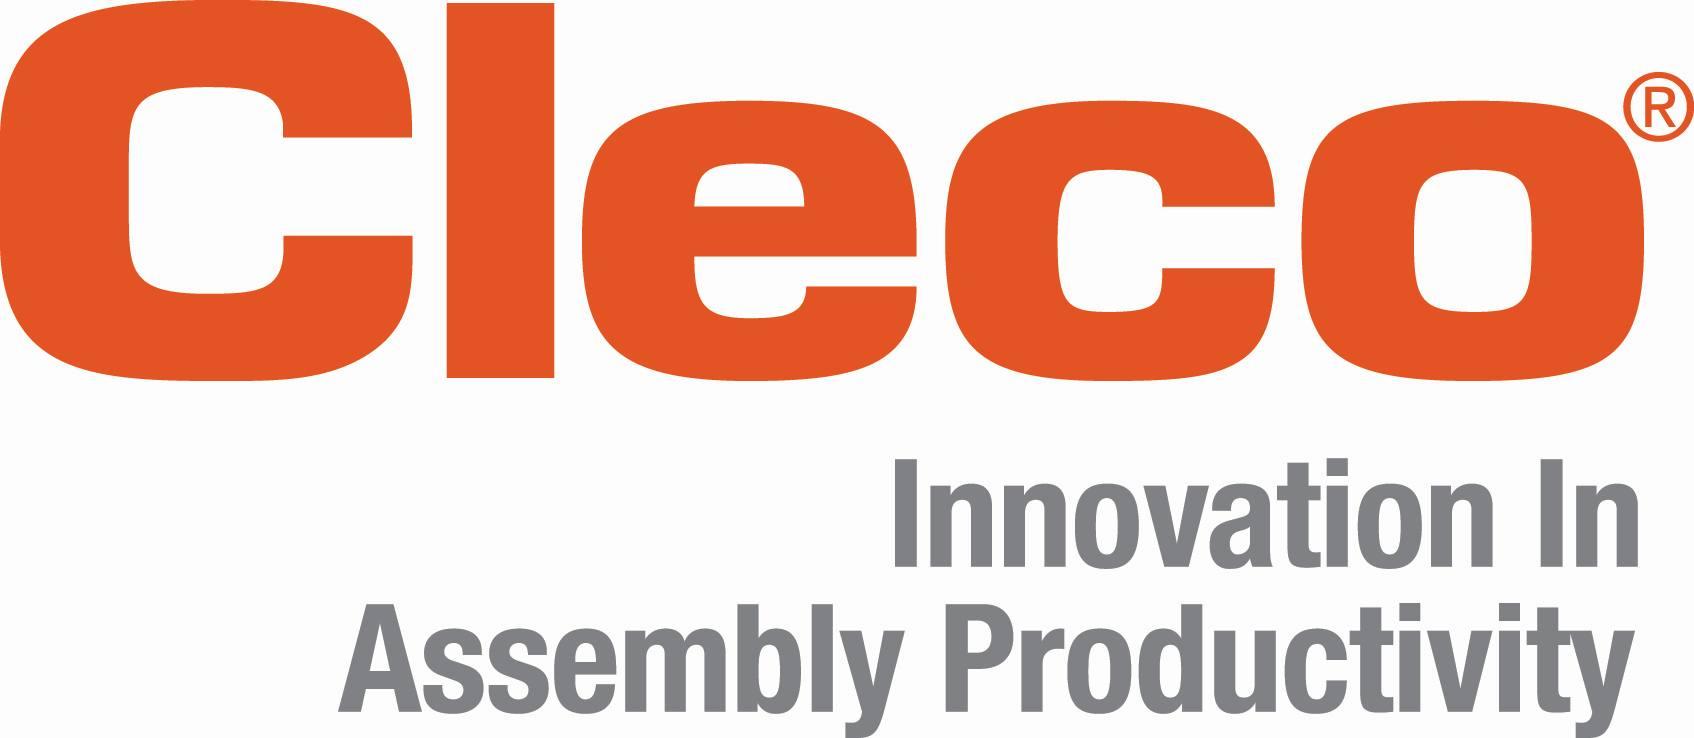 cleco-assembly-tool-logo.jpg